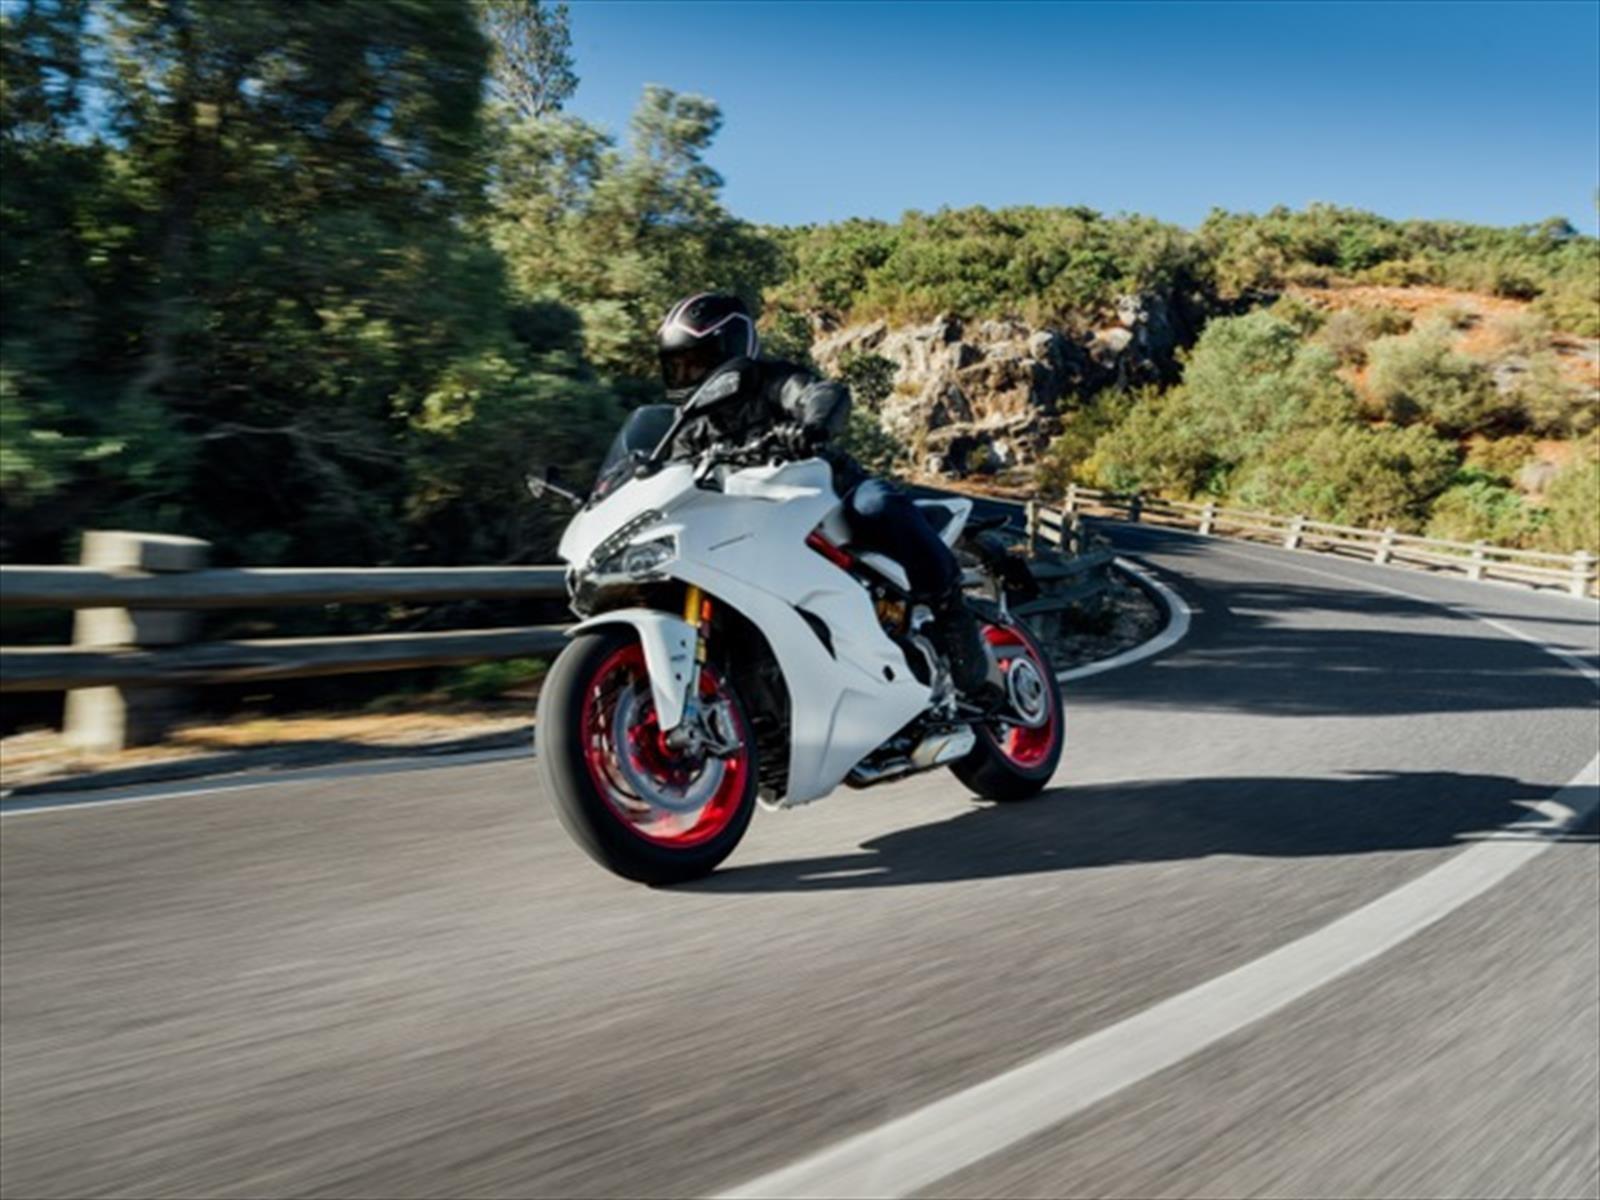 Ducati Supersport S, una moto muy deportiva que no deja de ser versátil